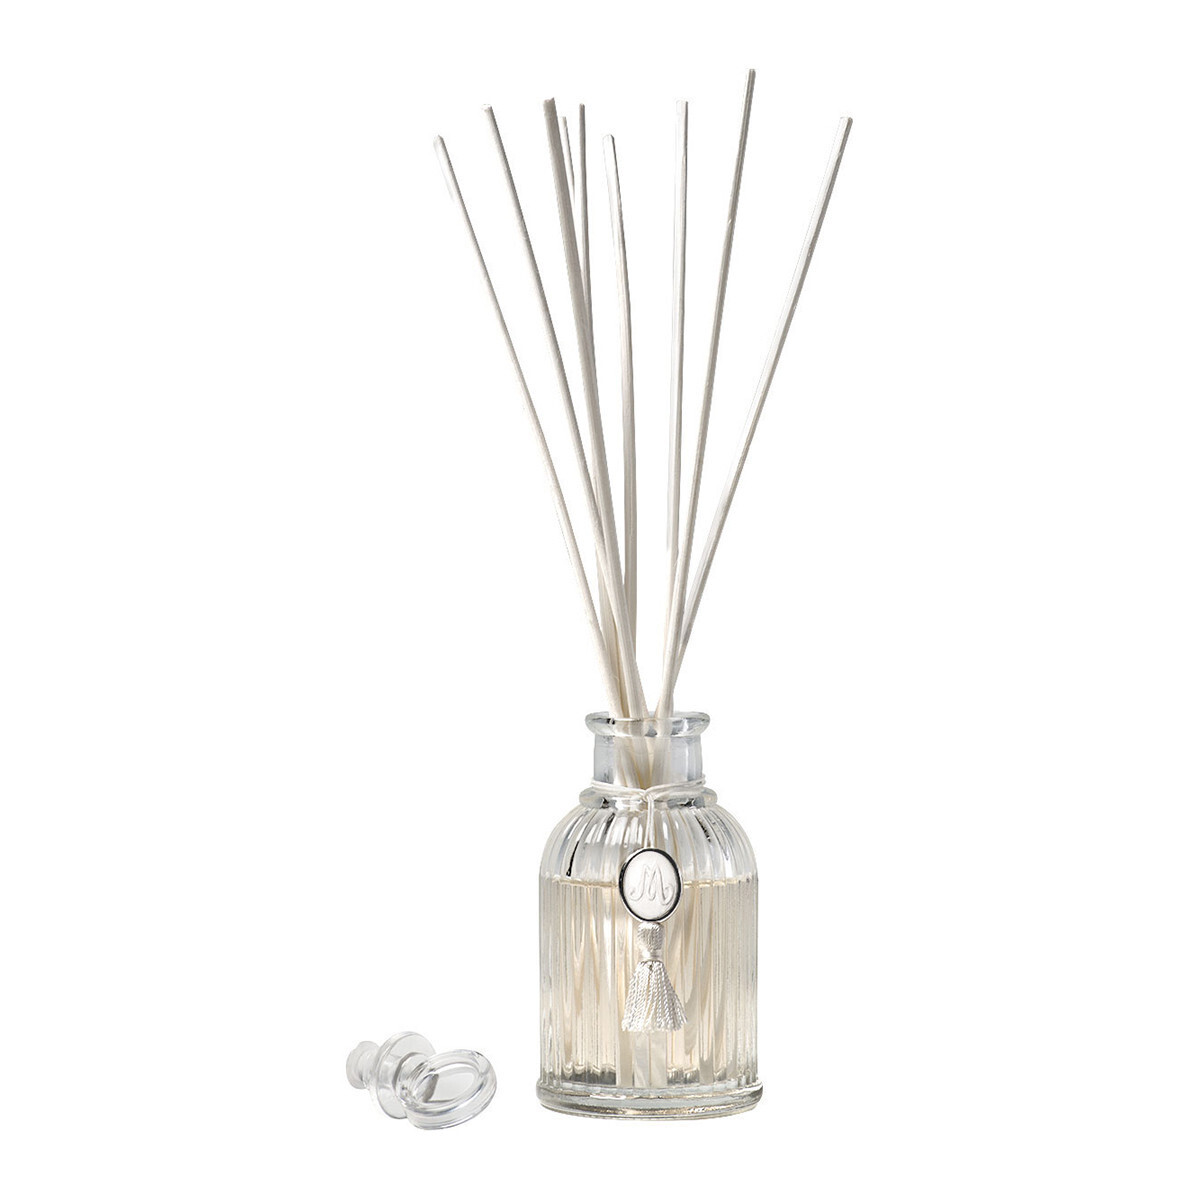 Geurstokken Mathilde M 90ml Fleur De Cotton